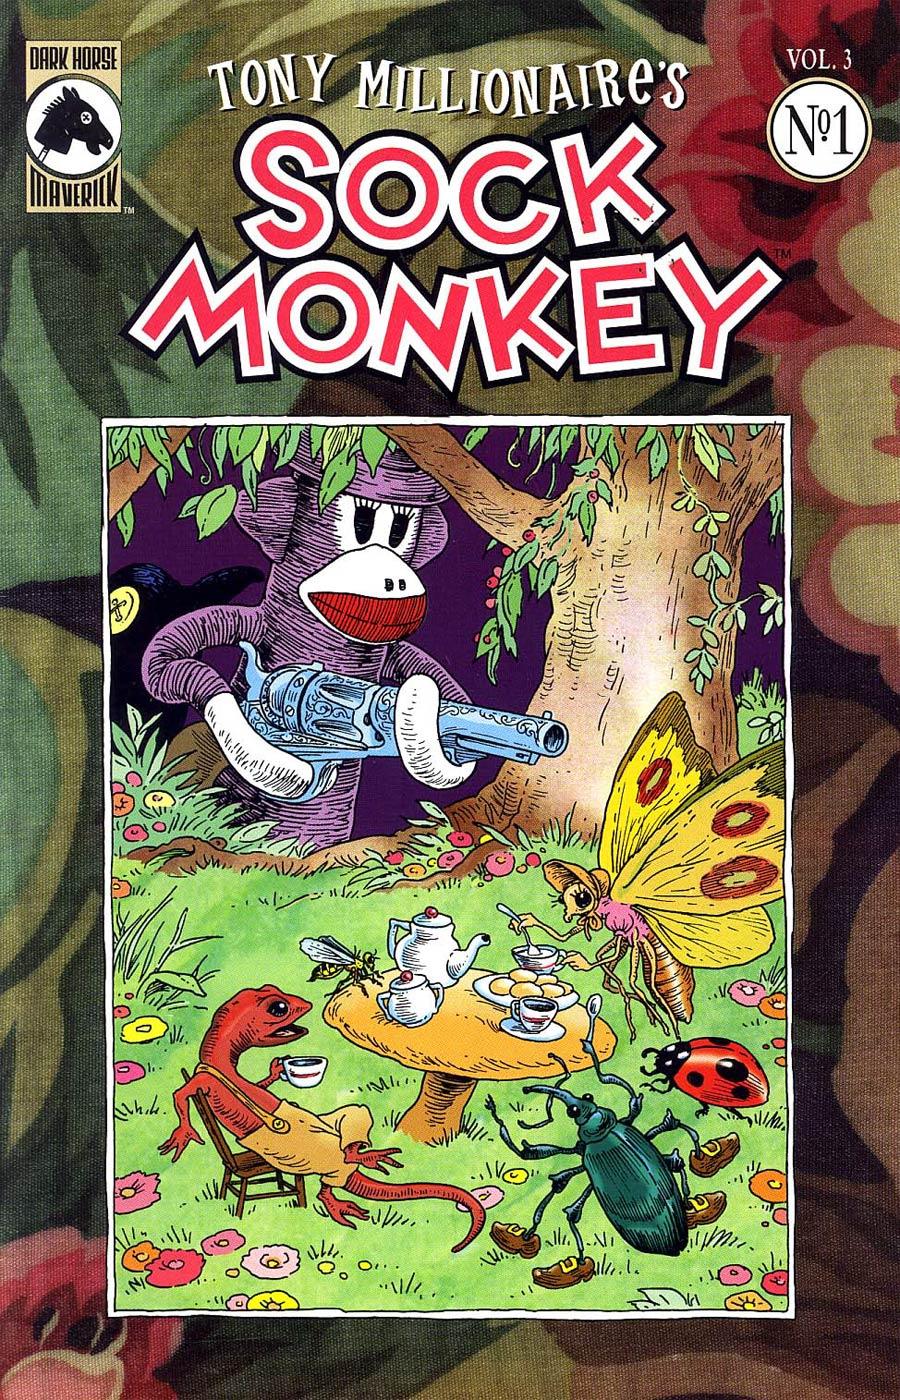 Sock Monkey Vol 3 #1